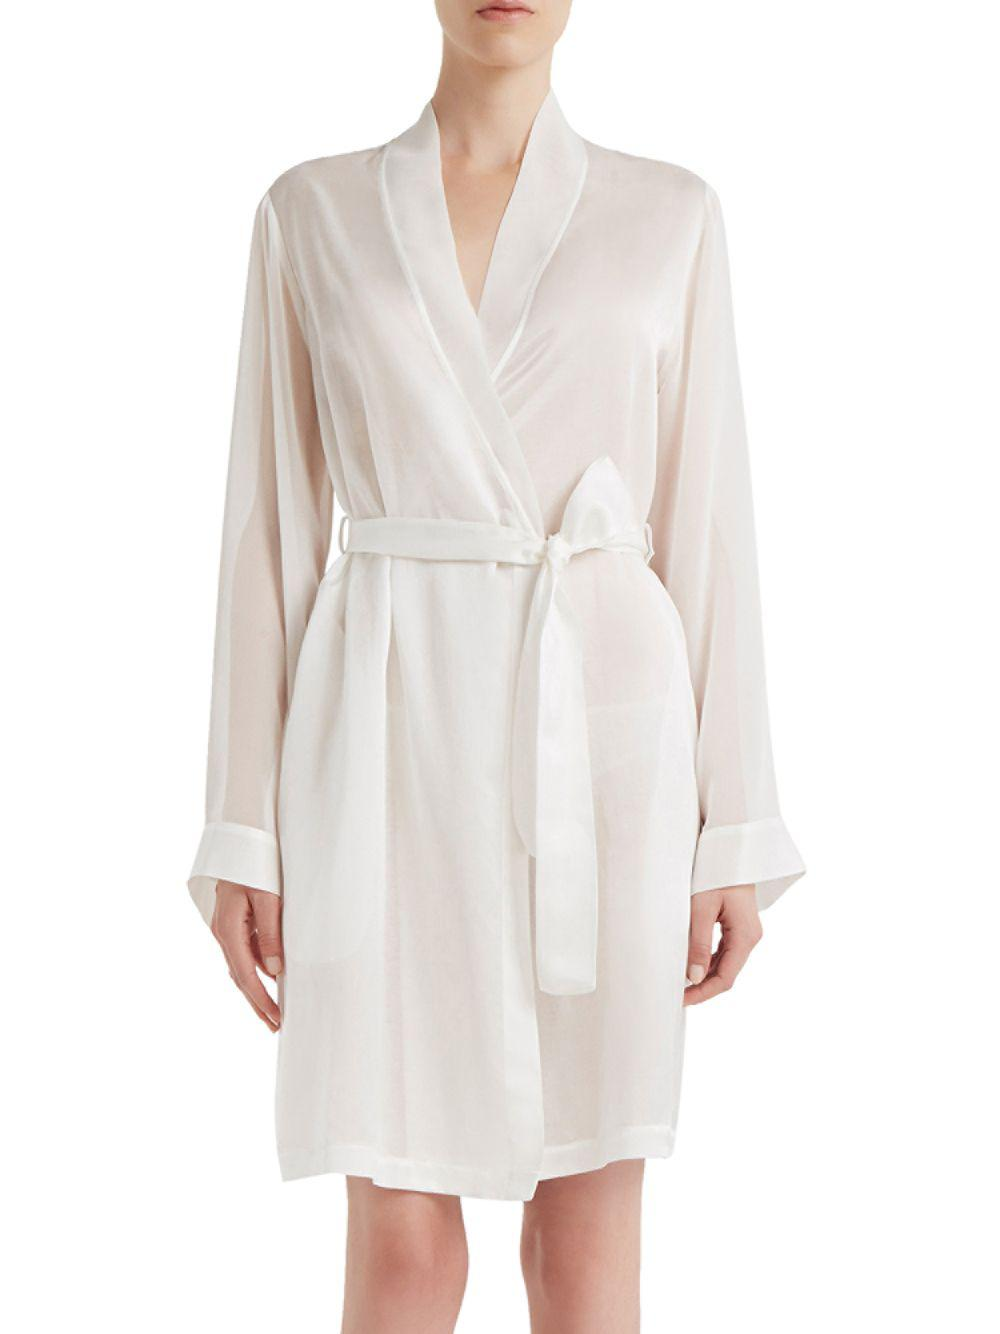 La Perla Jazz Time Cotton   Silk Short Night Robe in White - Lyst a844c0ee0